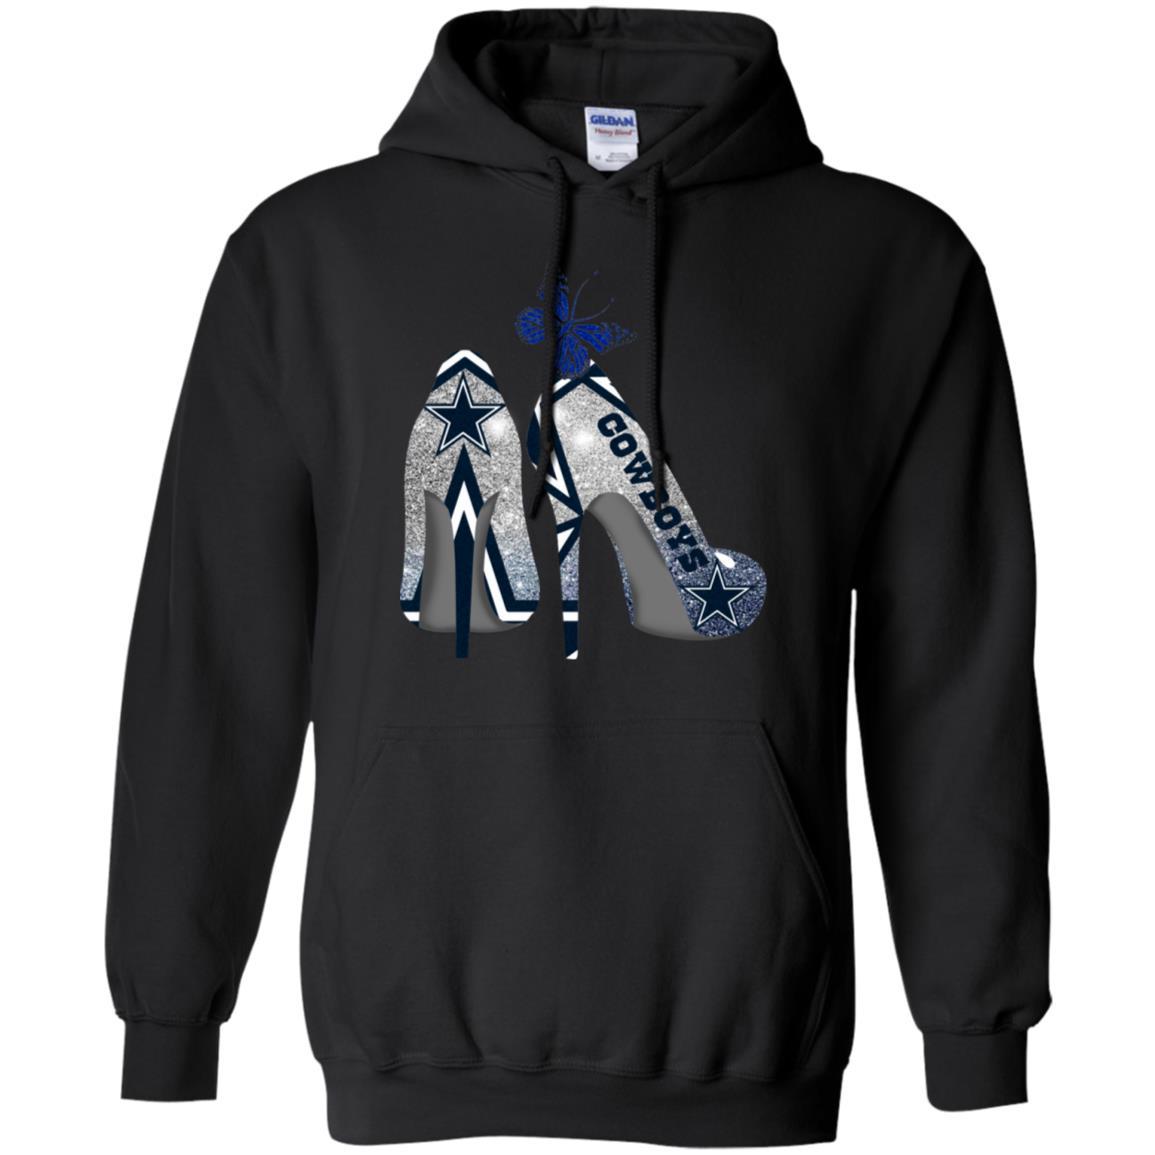 on sale 15671 00204 Dallas Cowboys Sexy High Heels T shirt, Ls, Hoodie